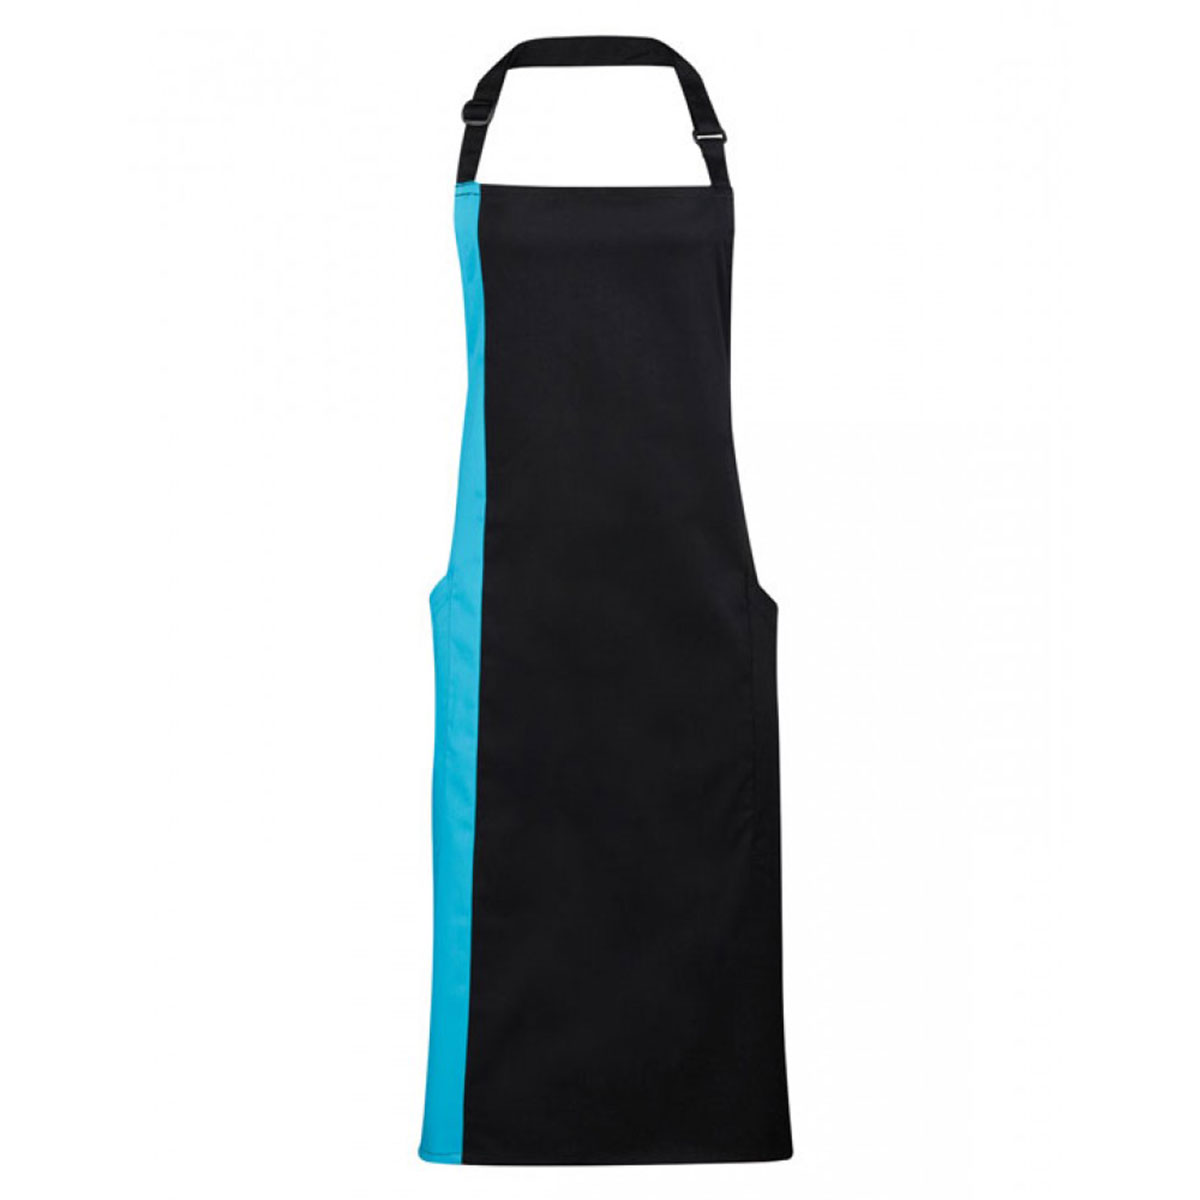 Contrast Bib Apron - pr162-black-turquoise